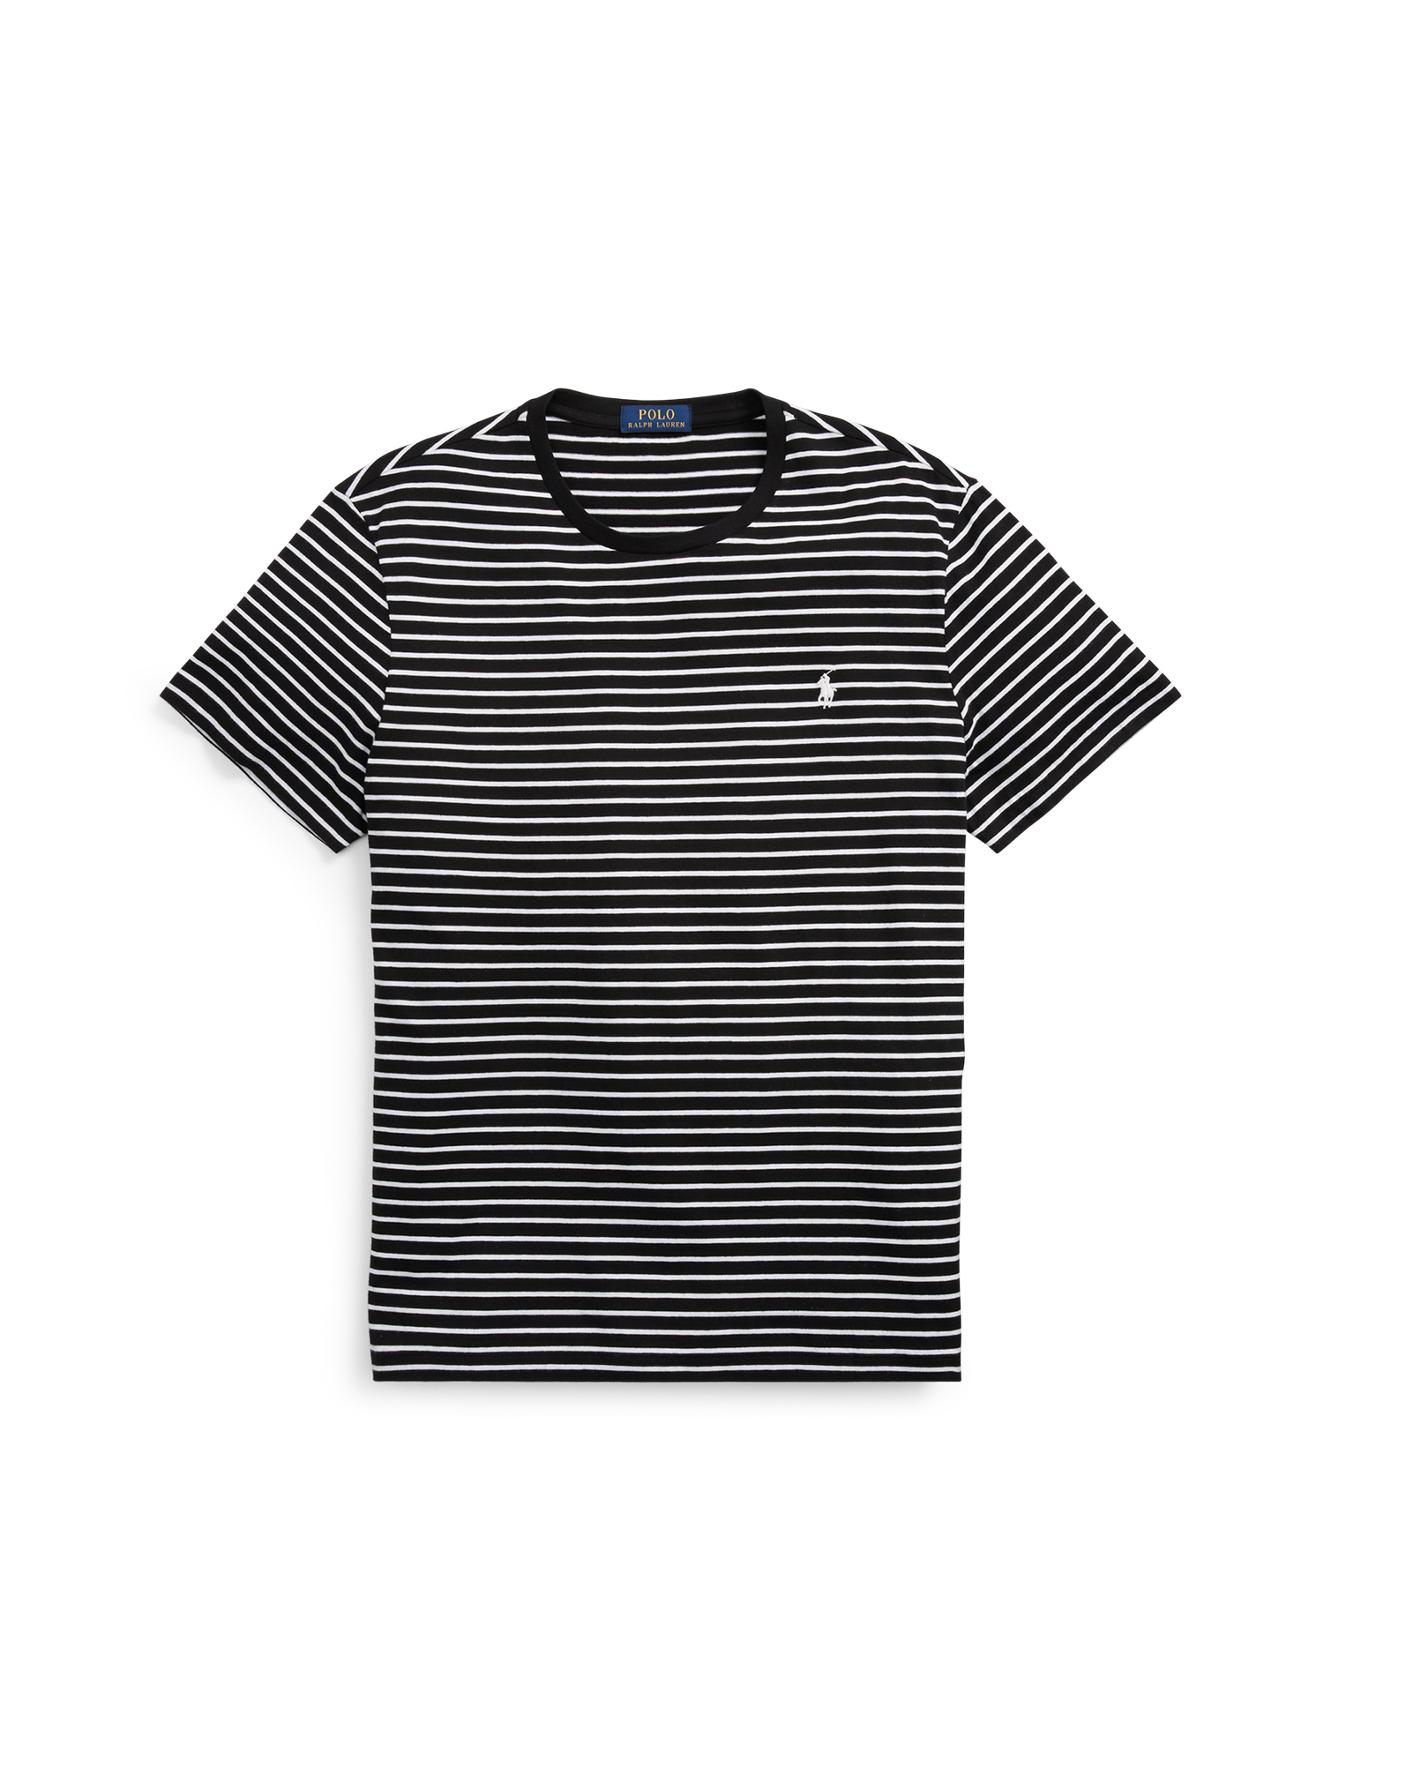 Black and white striped t shirt xxl - Striped Cotton Jersey T Shirt Big Tall Tees Ralphlauren Com